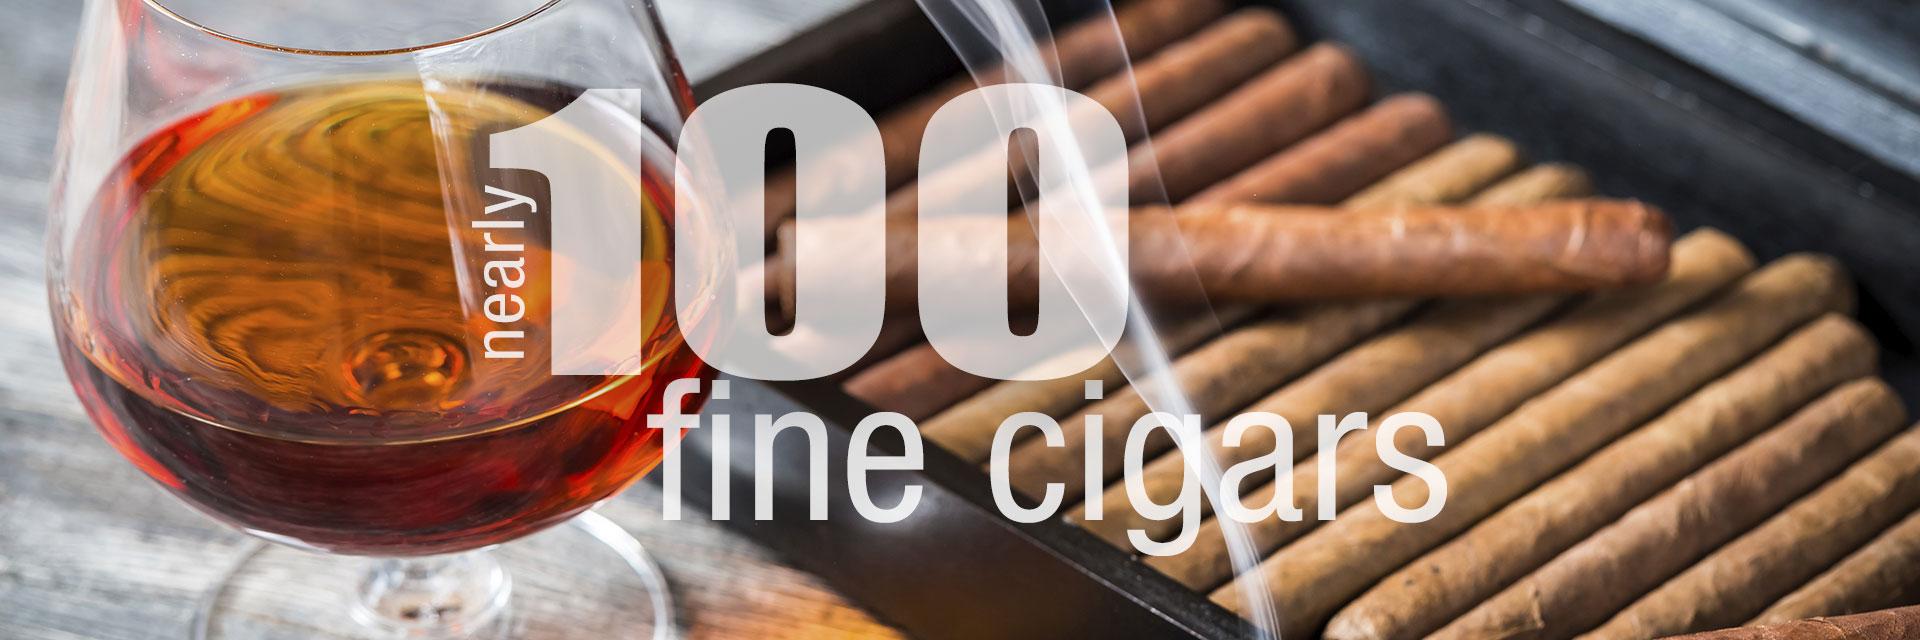 Nearly 100 Fine Cigars